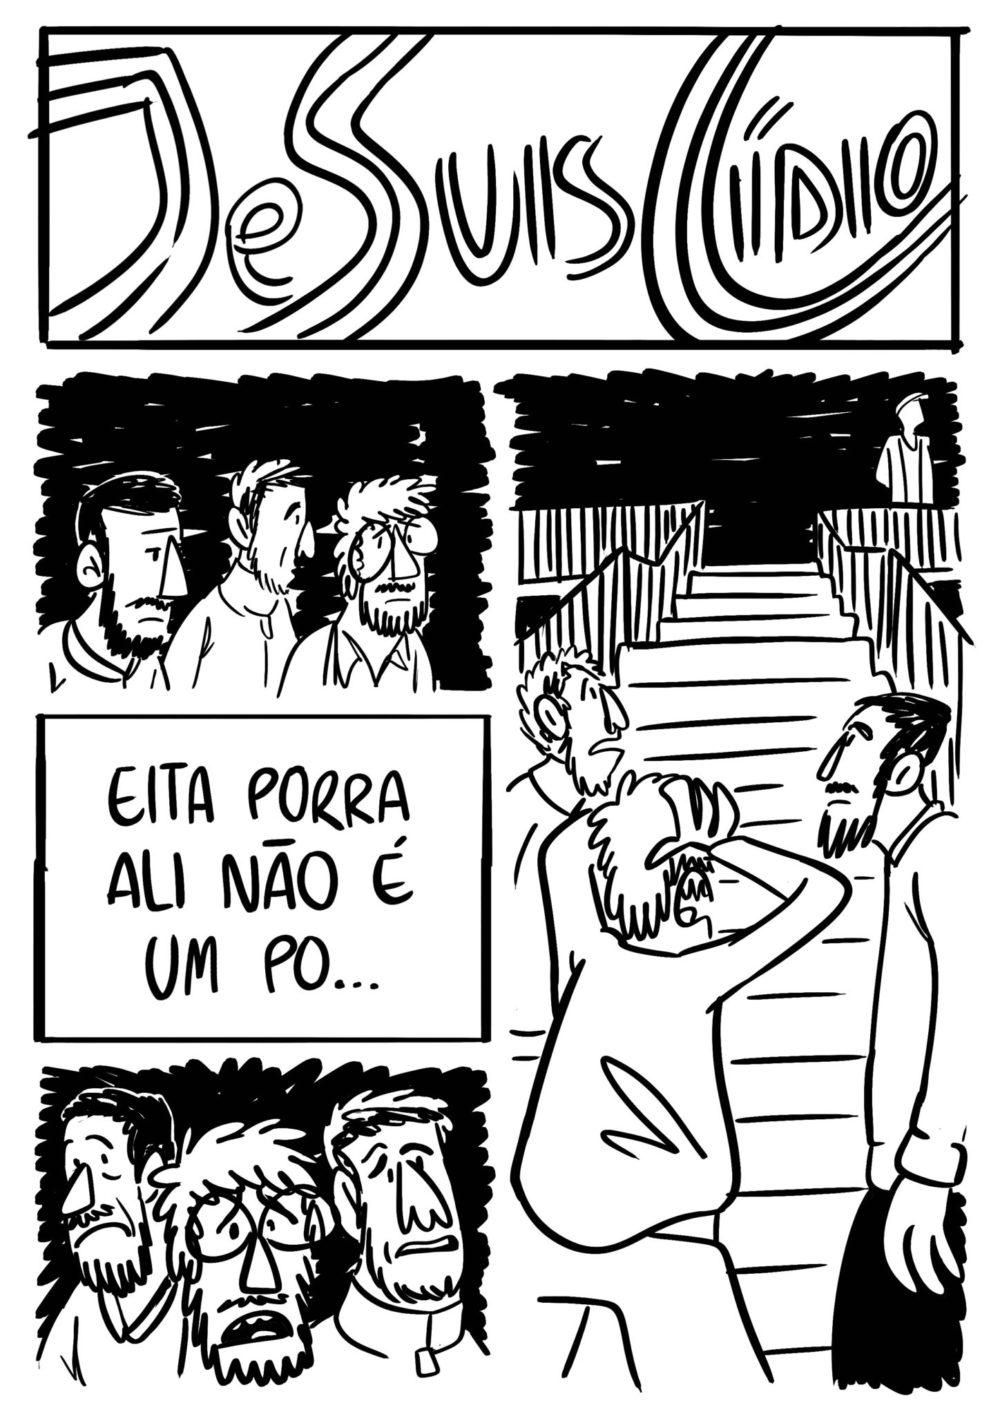 Je Suis Cídio #9, por João B. Godoi